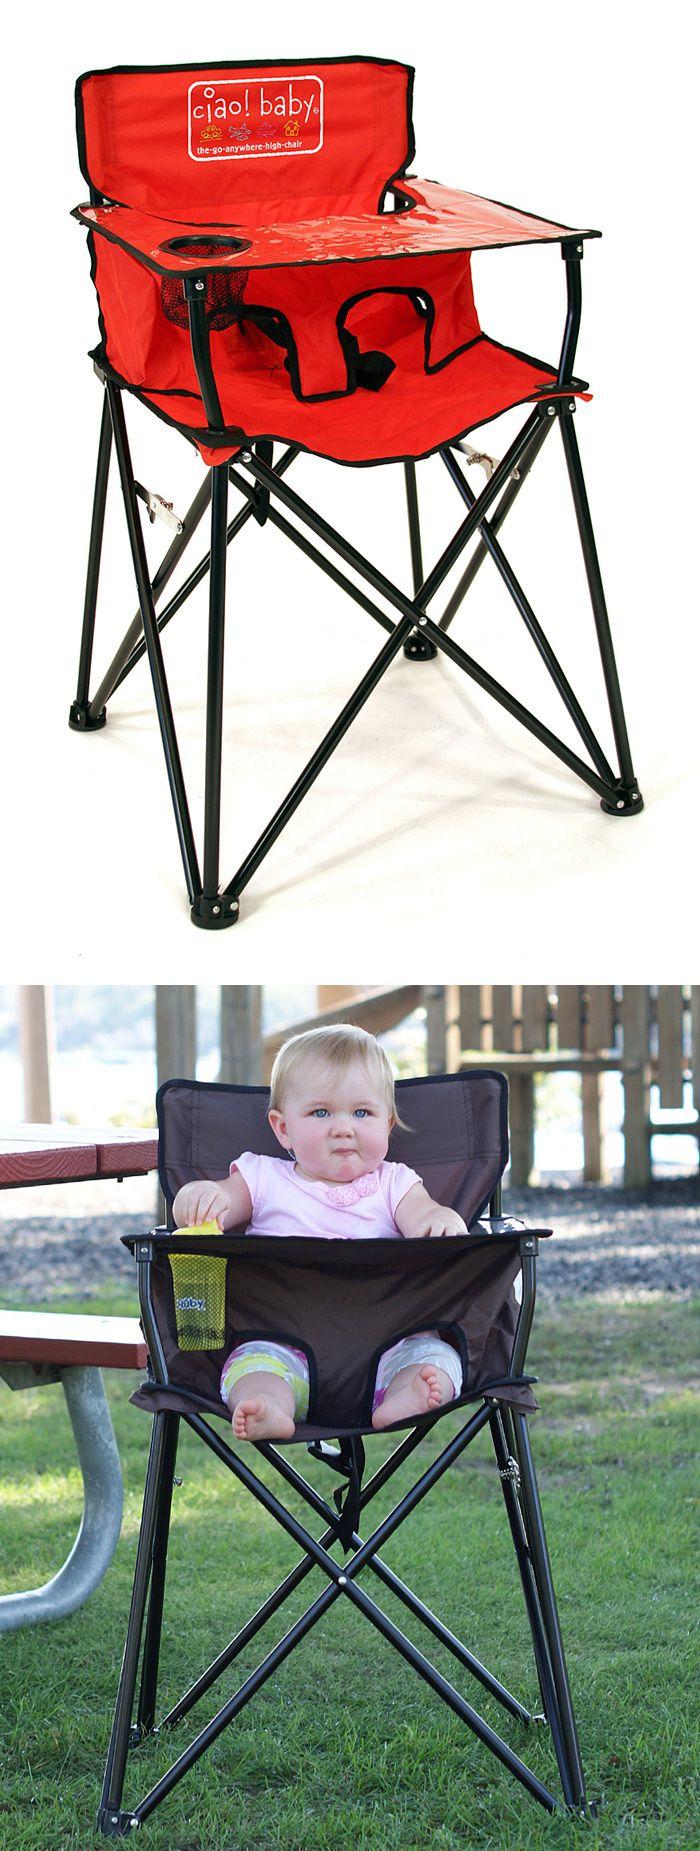 Baby Portable Travel High Chair. Genius.